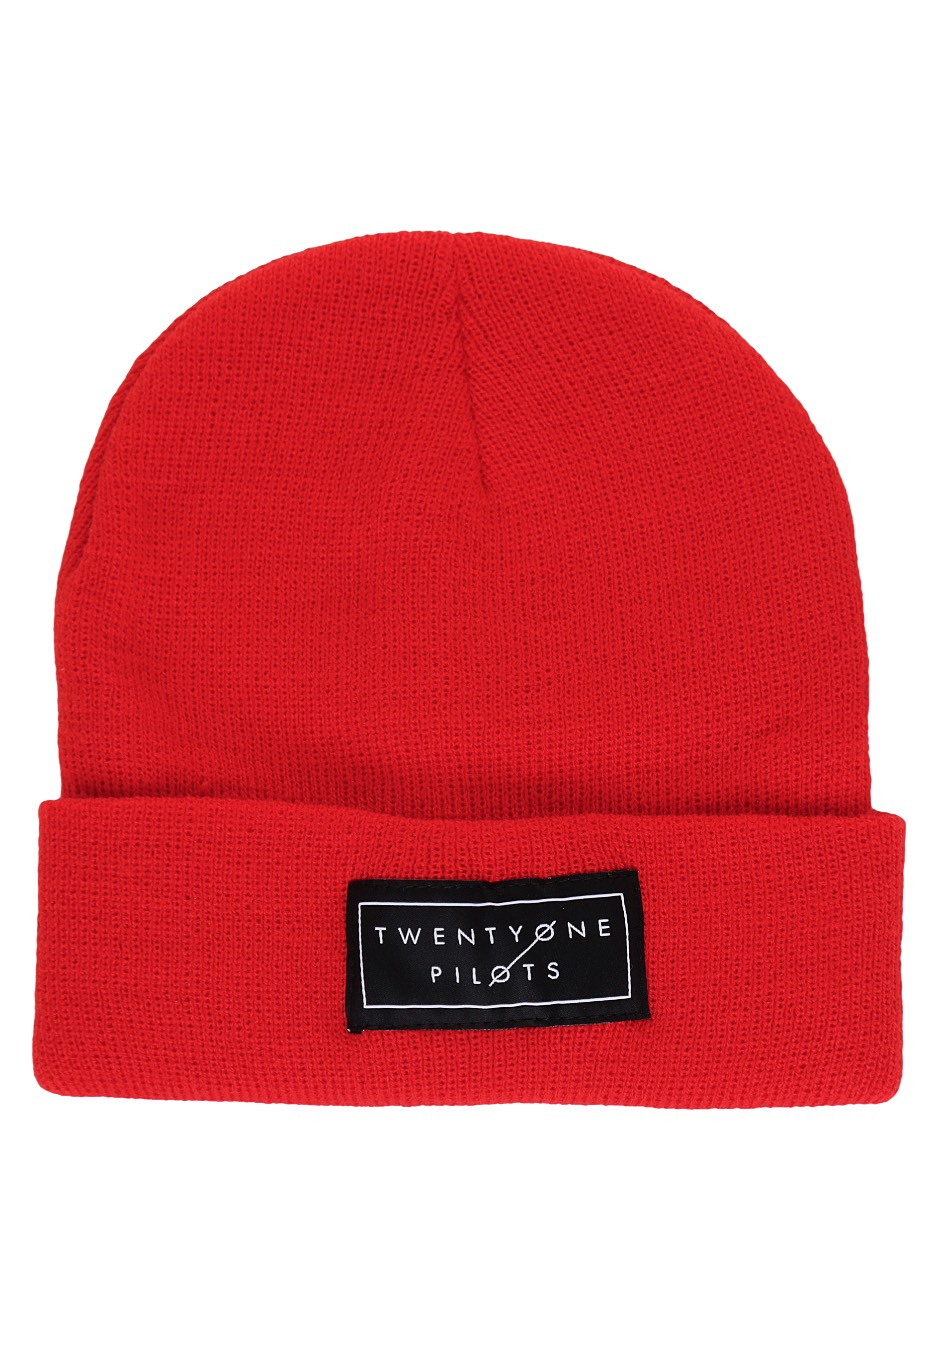 Twenty One Pilots - Logo Red - Beanie - Official Electronic Merchandise  Shop - Impericon.com UK c528d93ca52